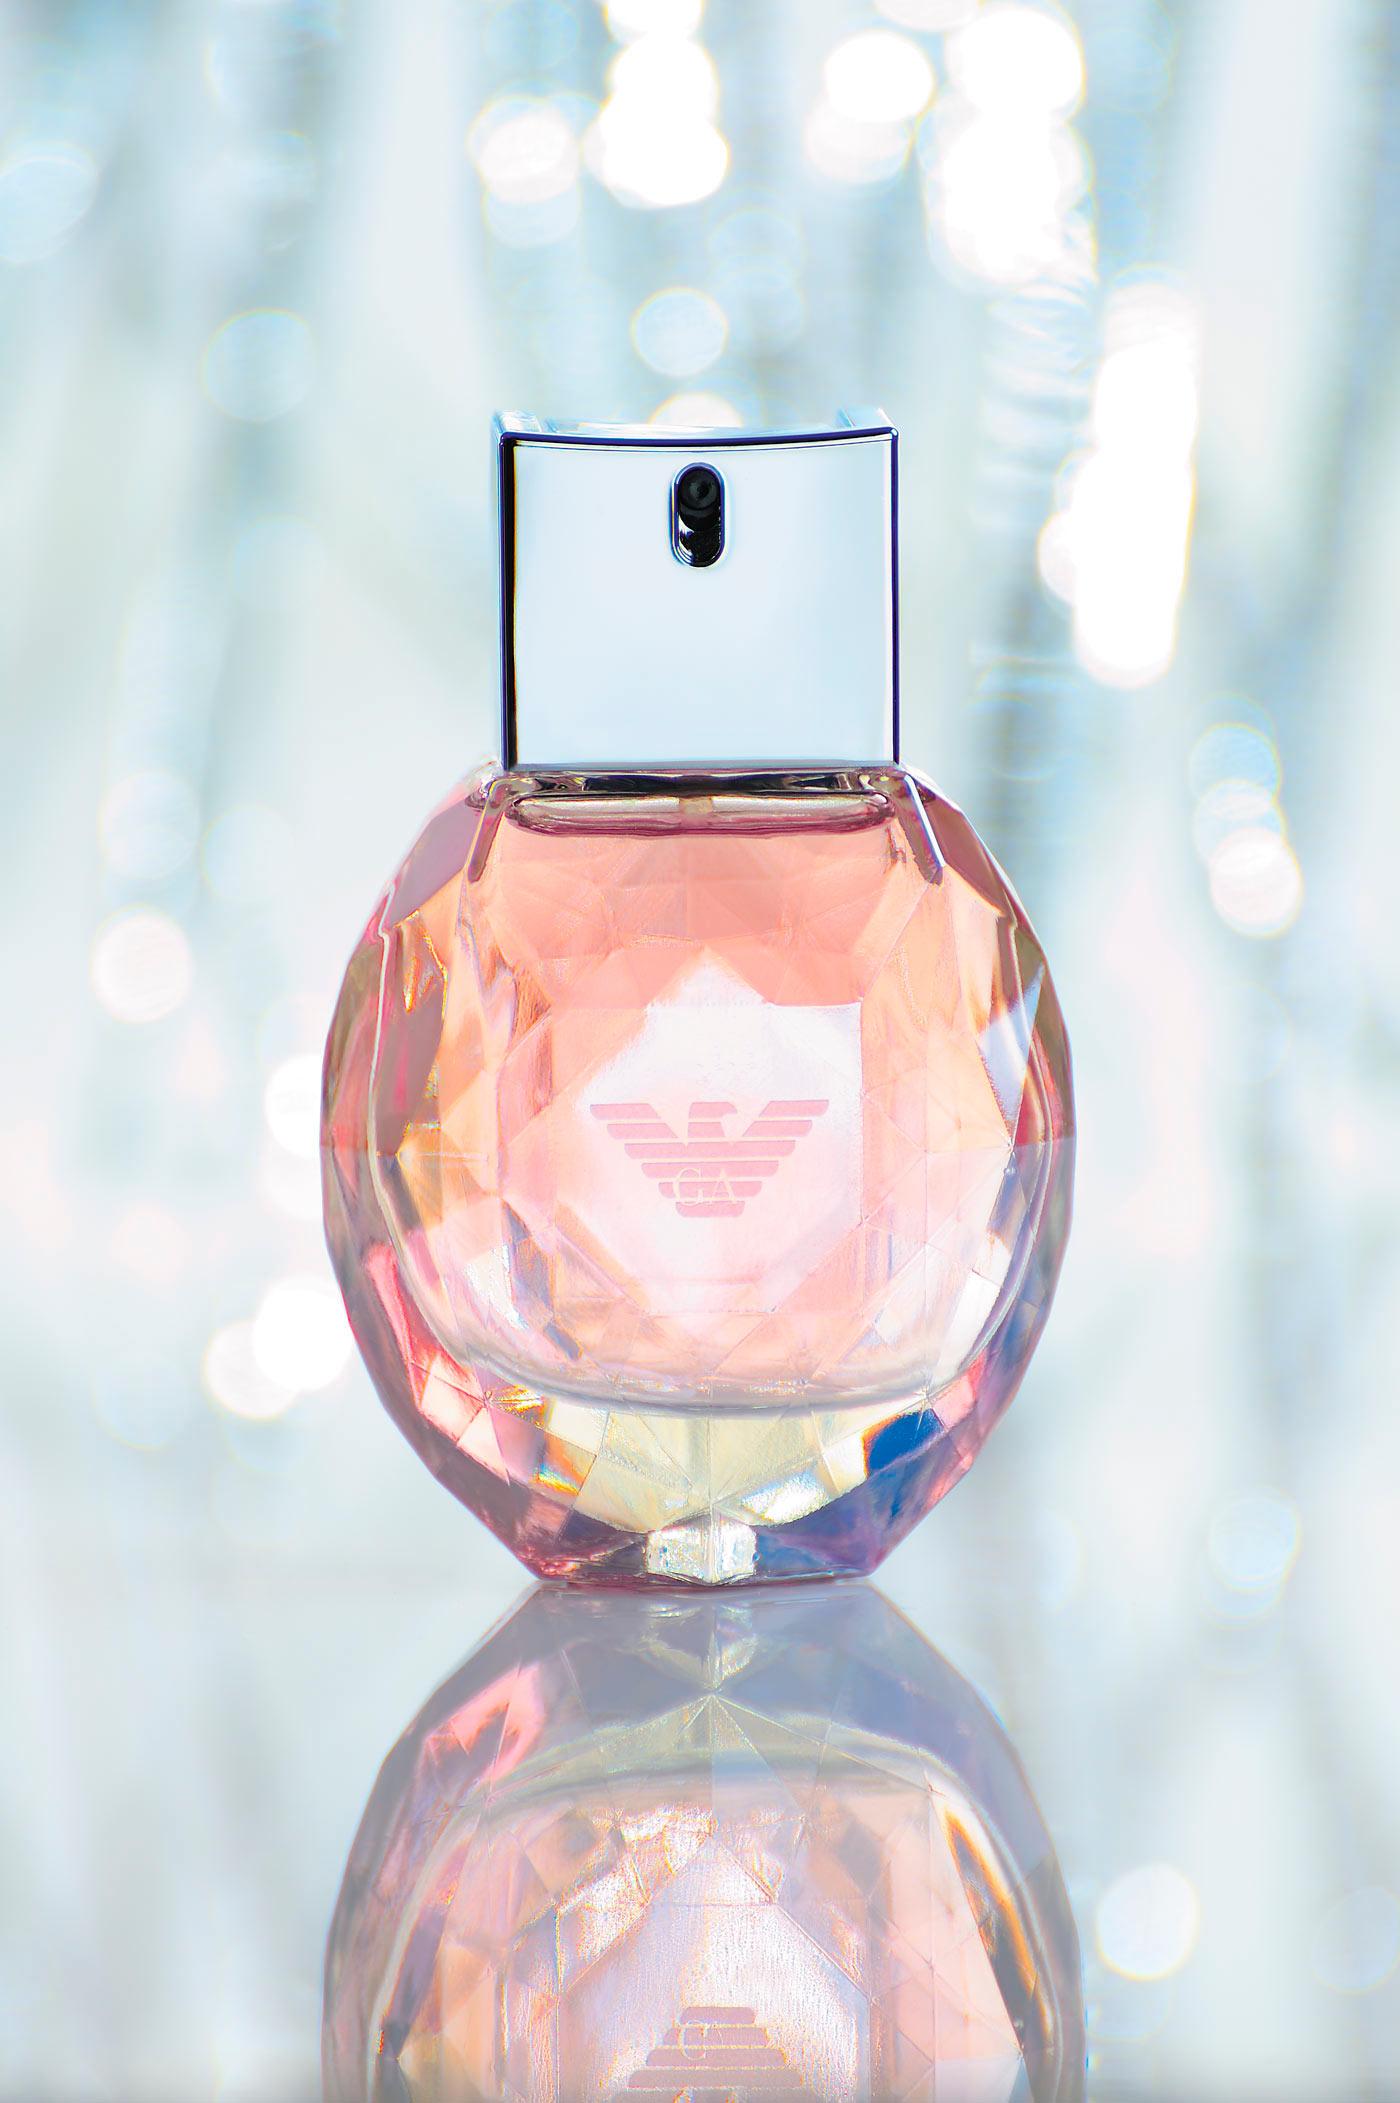 04) studio-product-perfume-phil-rowley-photography-02.jpg